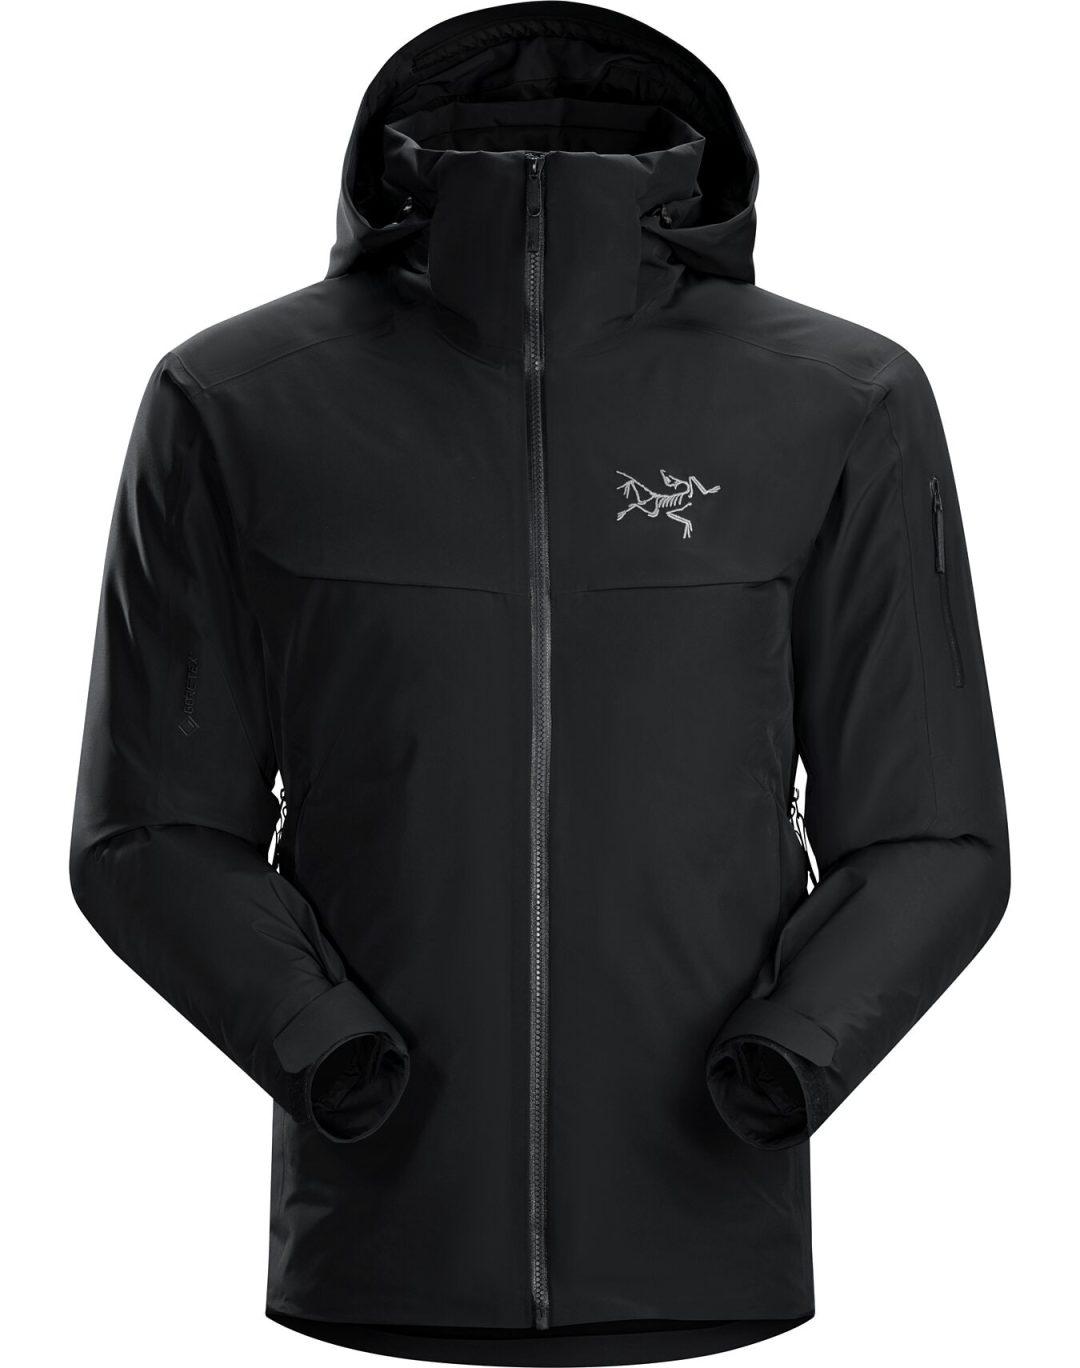 Luxury ski coat for men by Arc'teryx